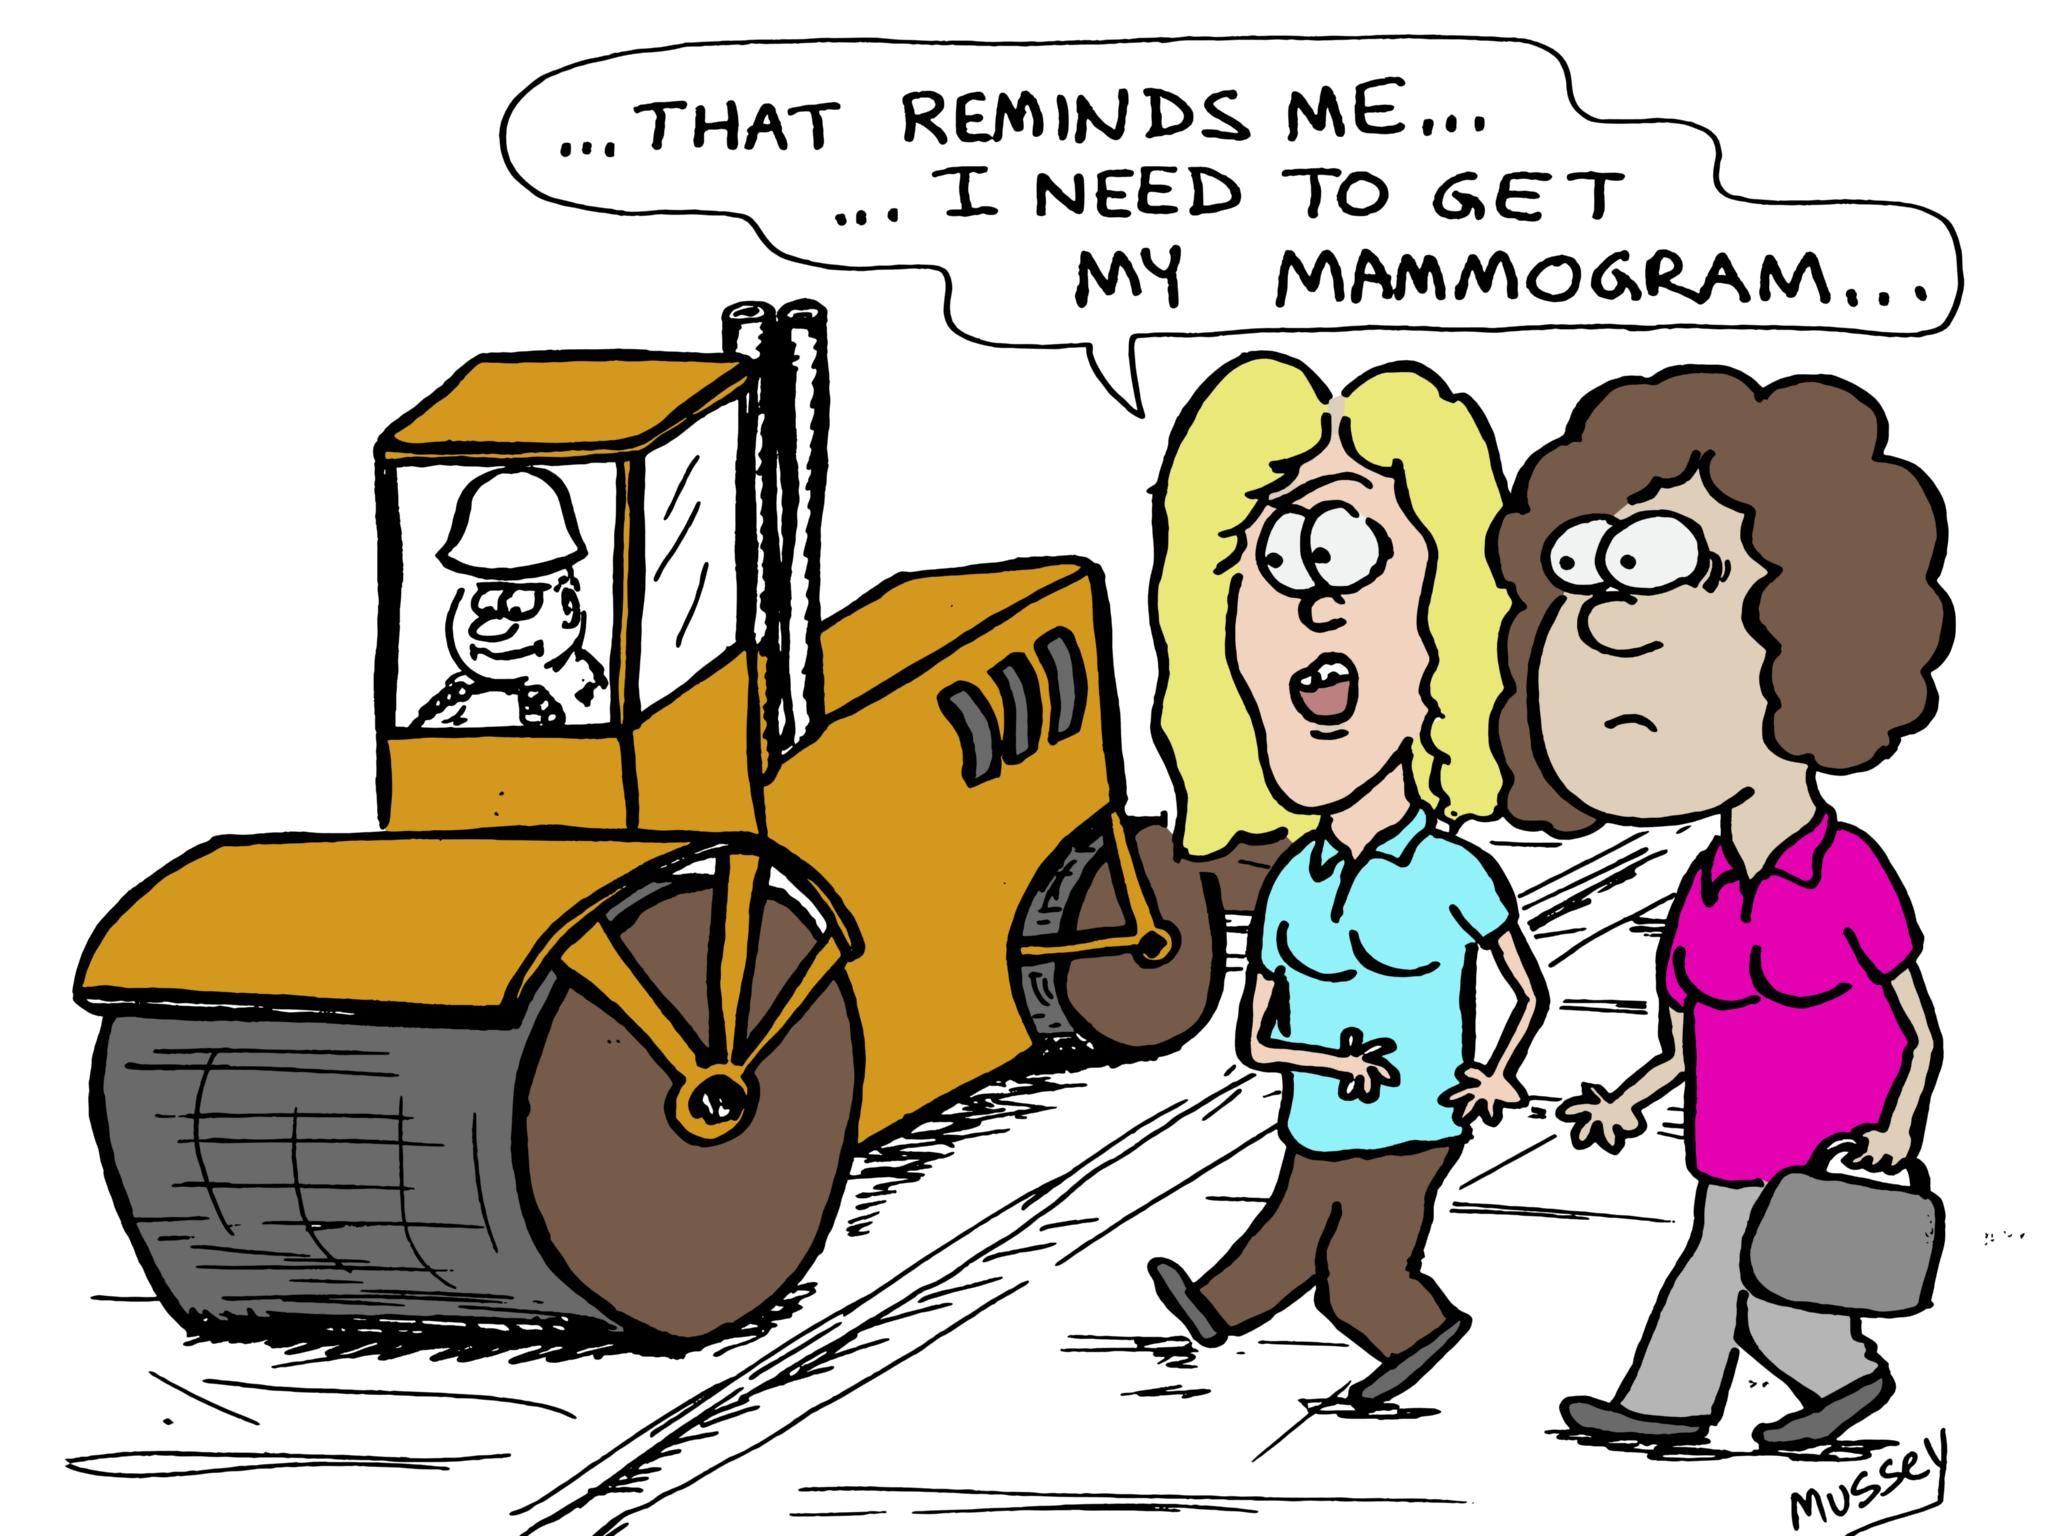 Mammogram Funny - Google Search